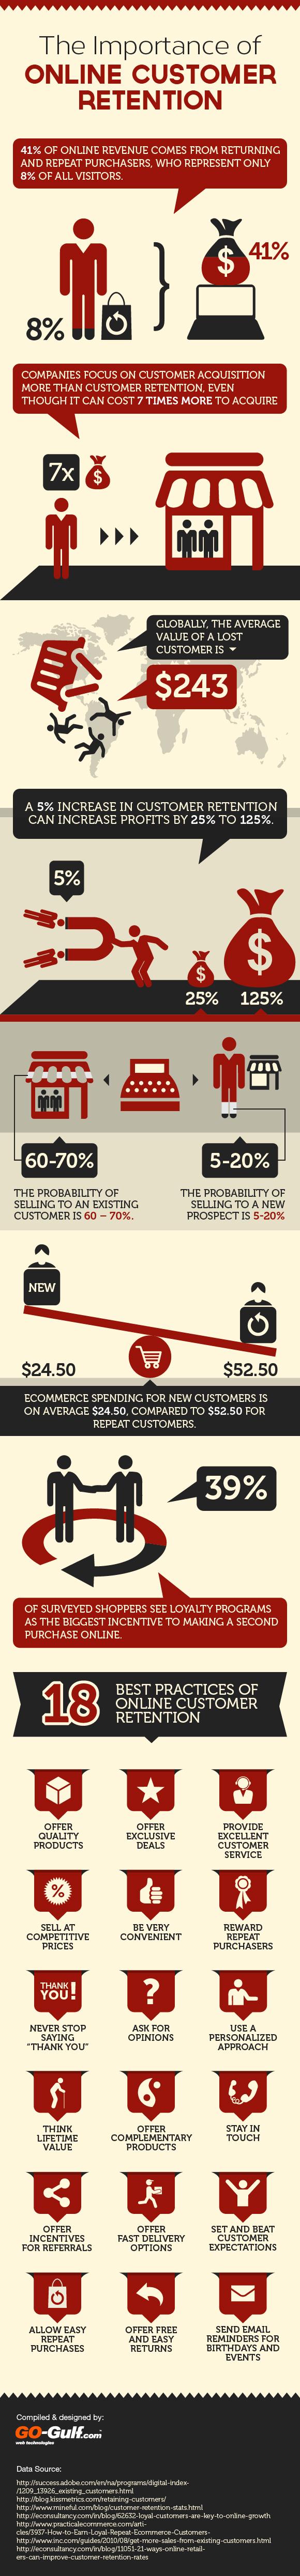 the-importance-of-online-customer-retention-infographic_51e8e7b4b0358